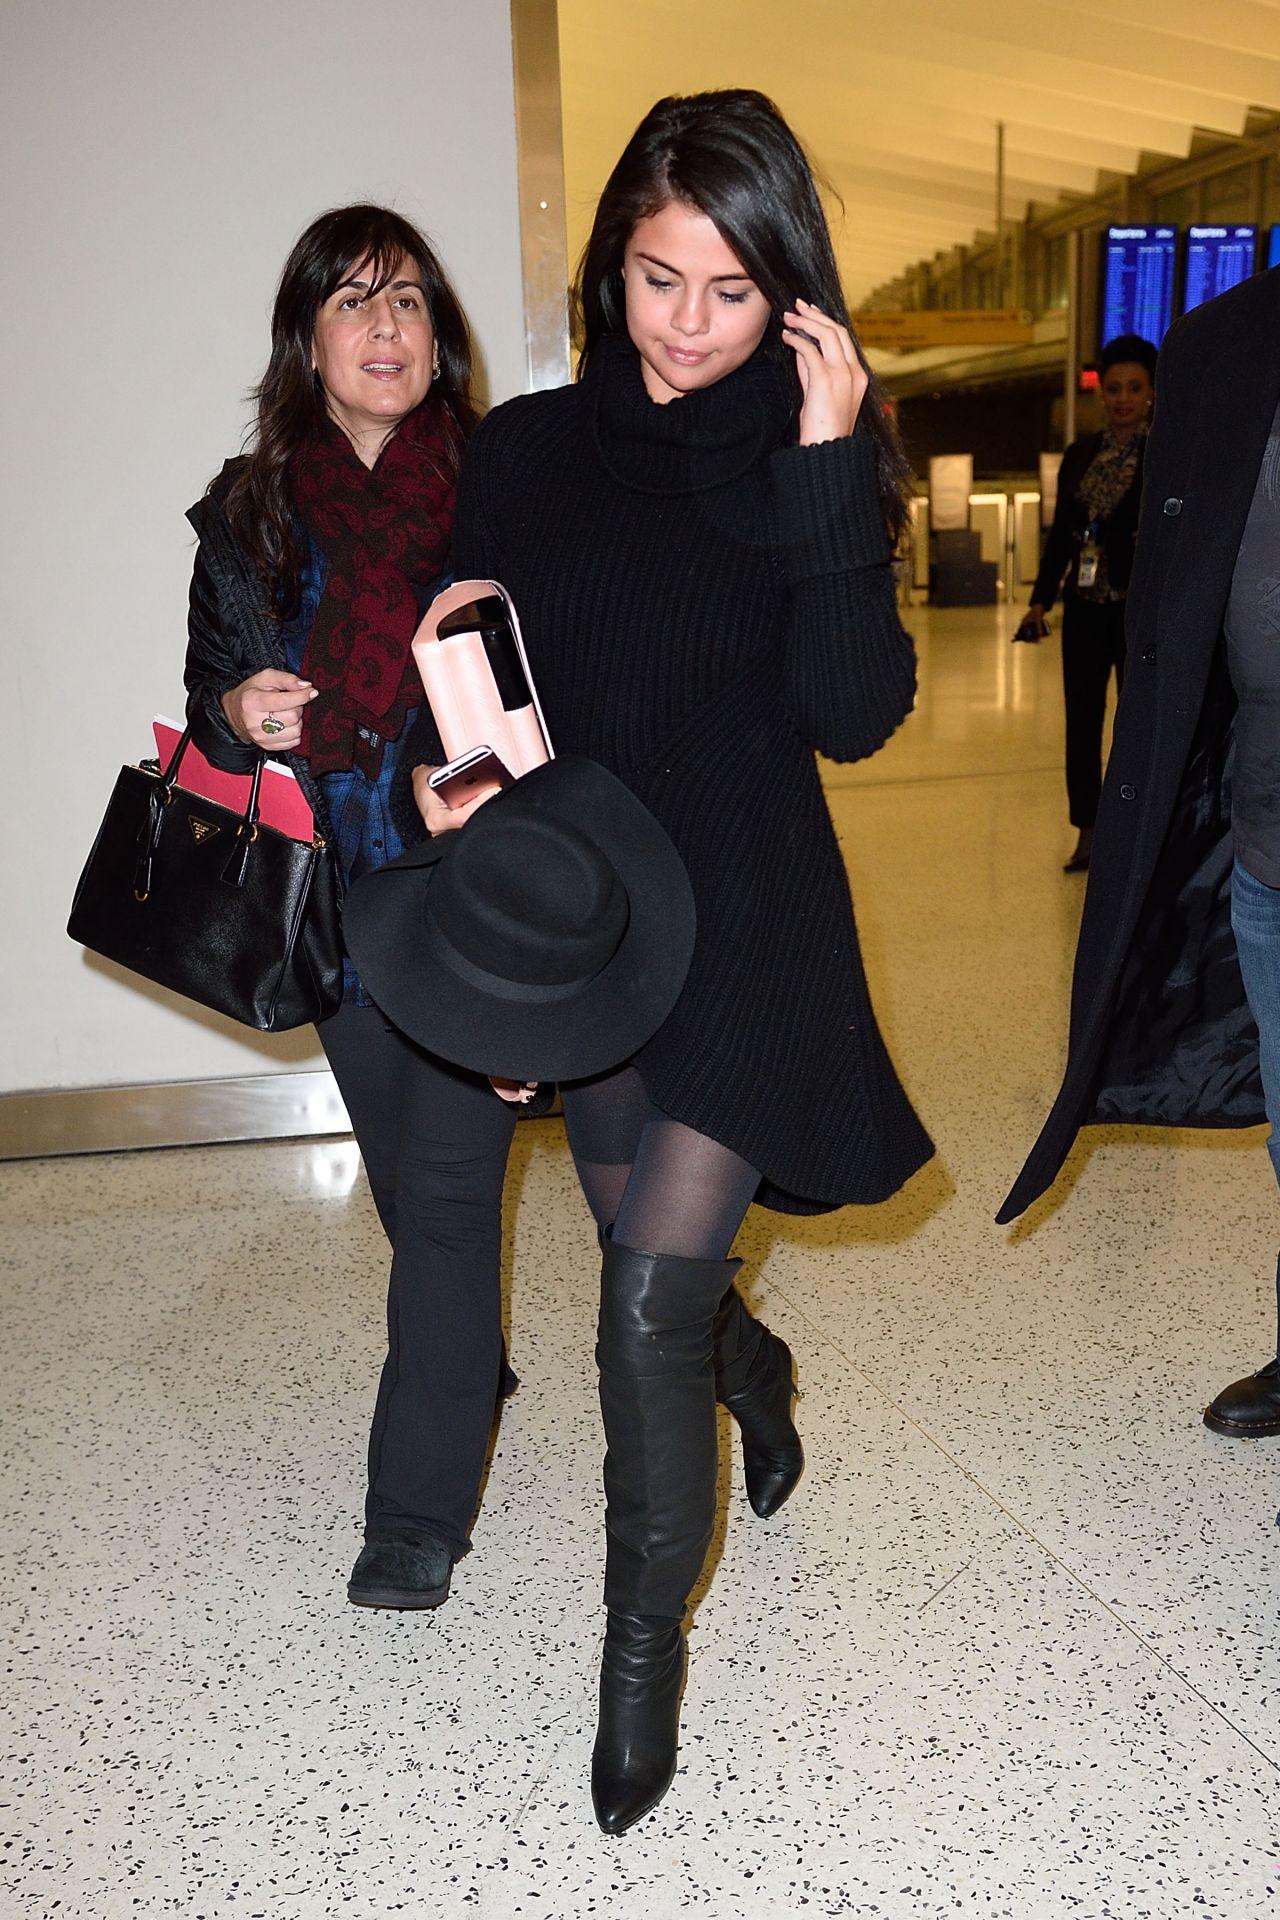 selena-gomez-arrives-at-jfk-airport-in-new-york-city-january-20-2016-9